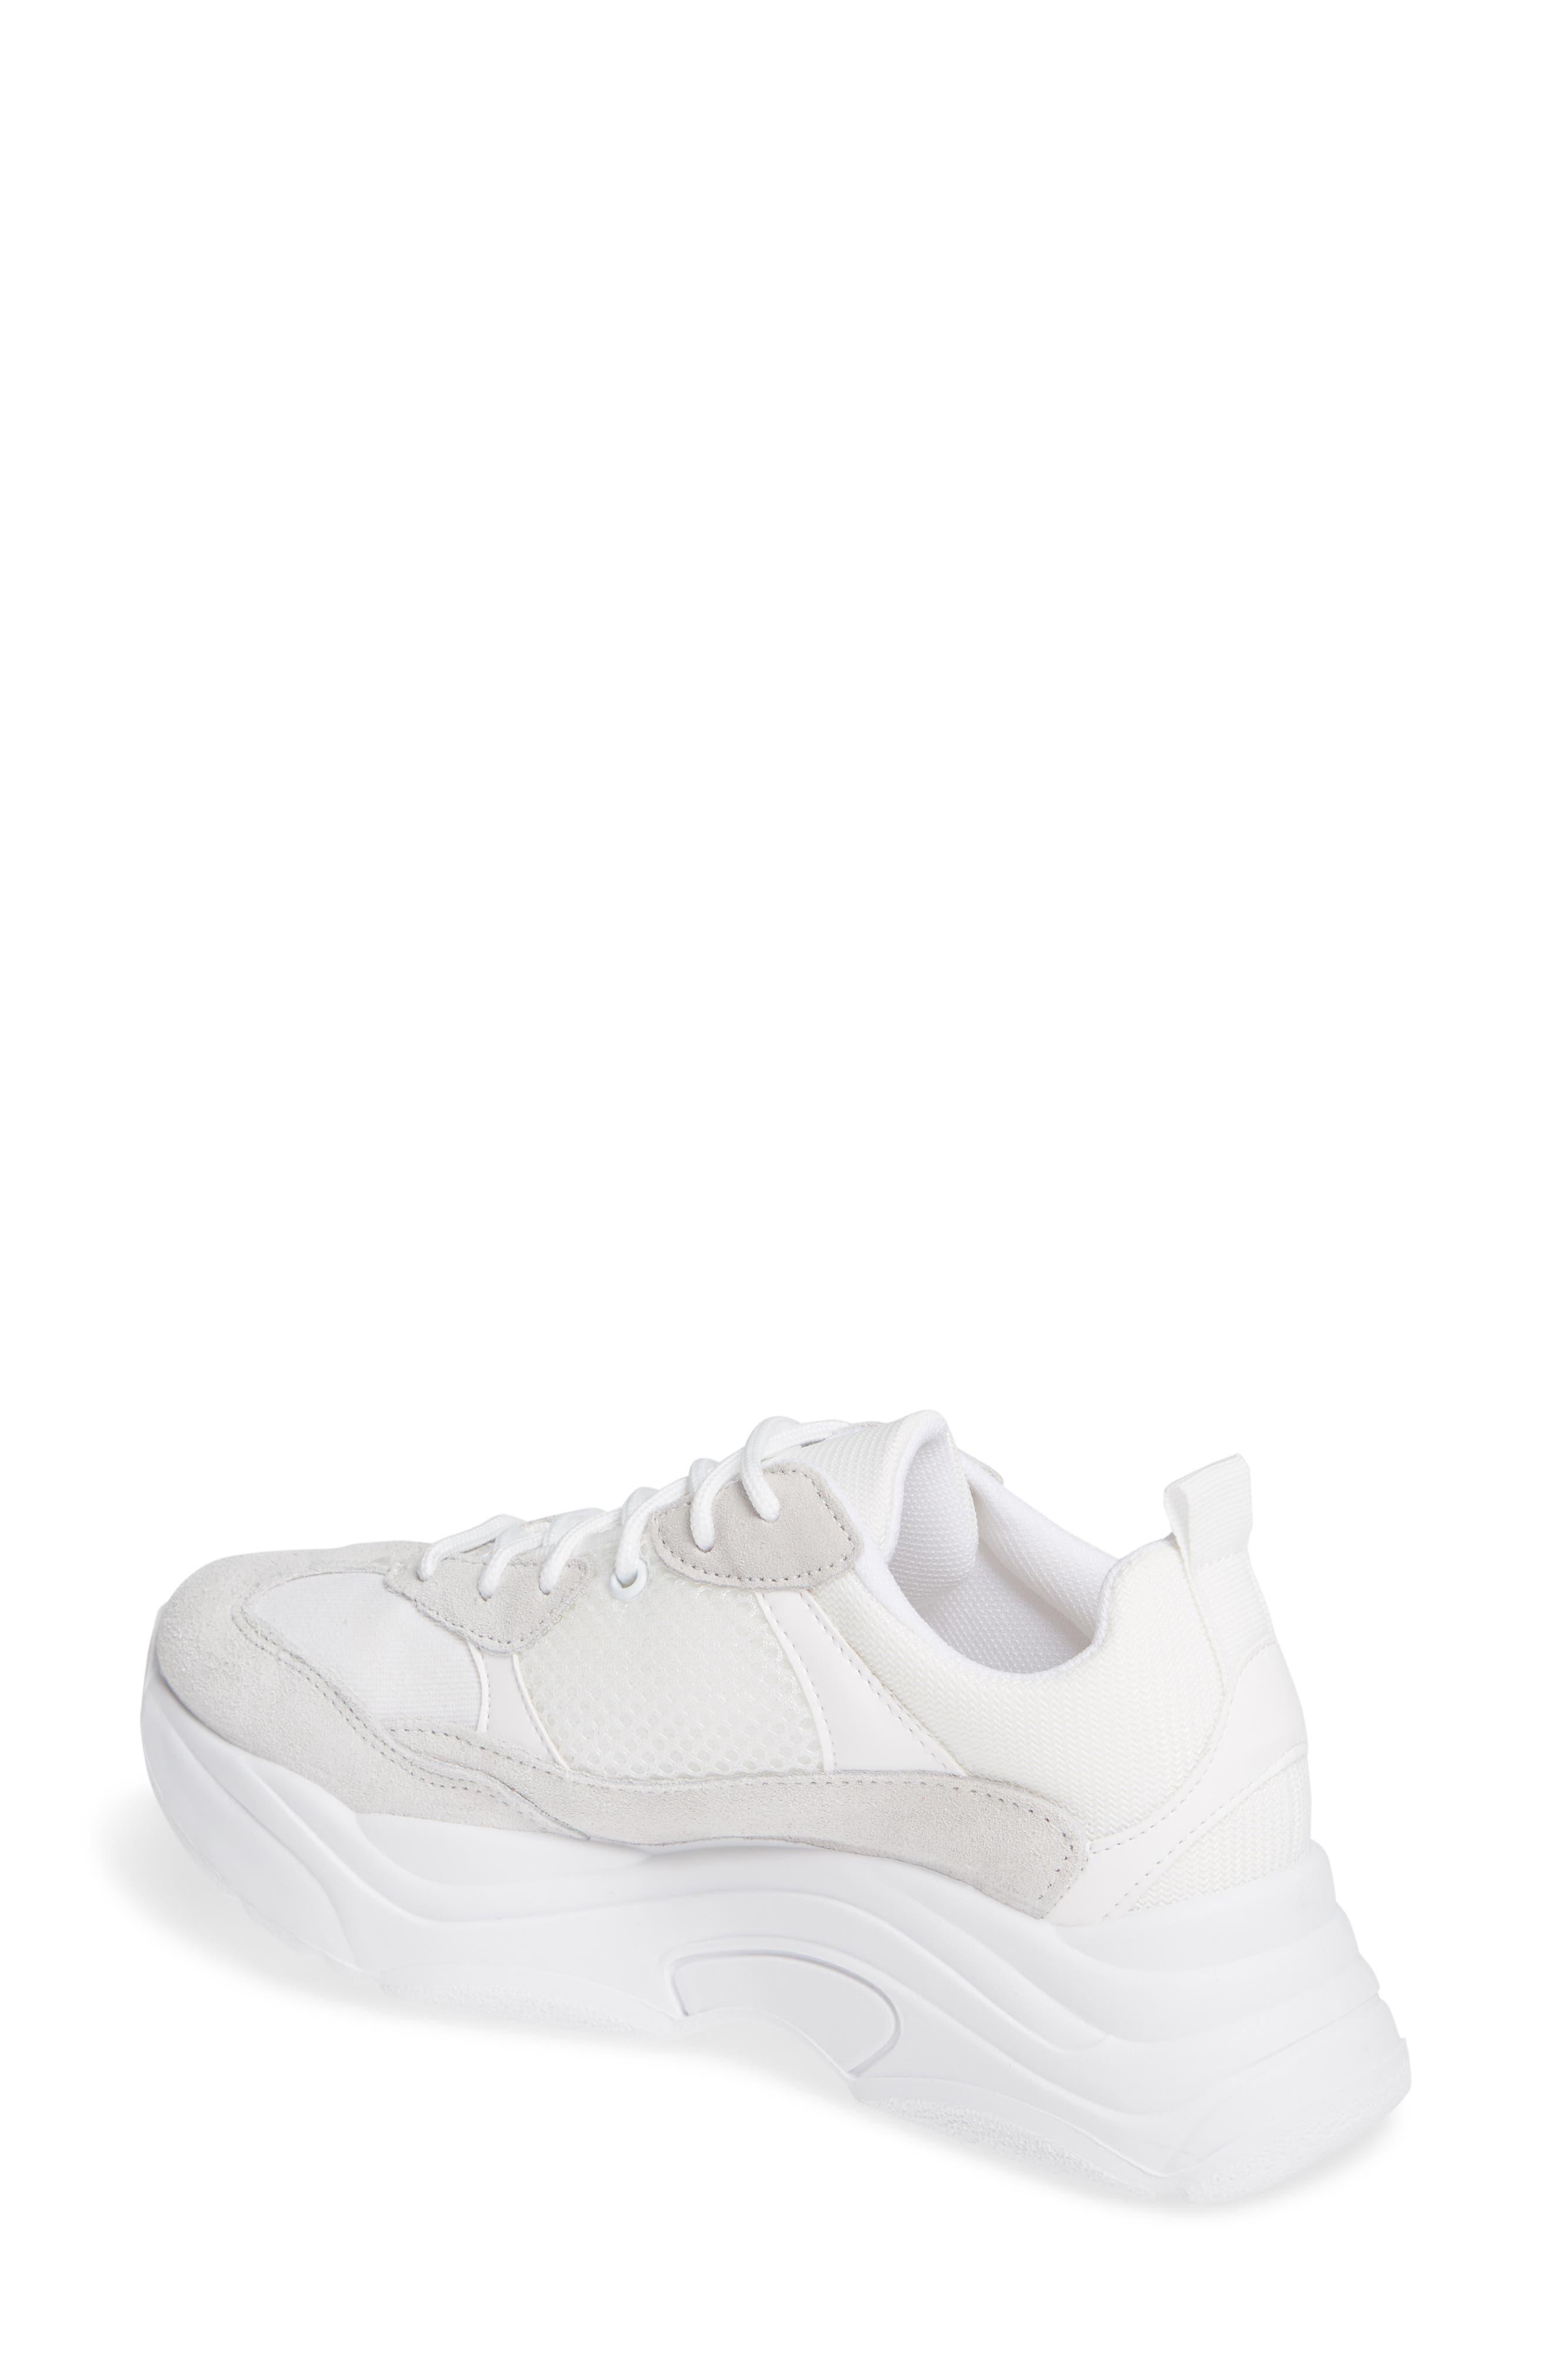 Ciara Chunky Sneaker,                             Alternate thumbnail 2, color,                             WHITE MULTI